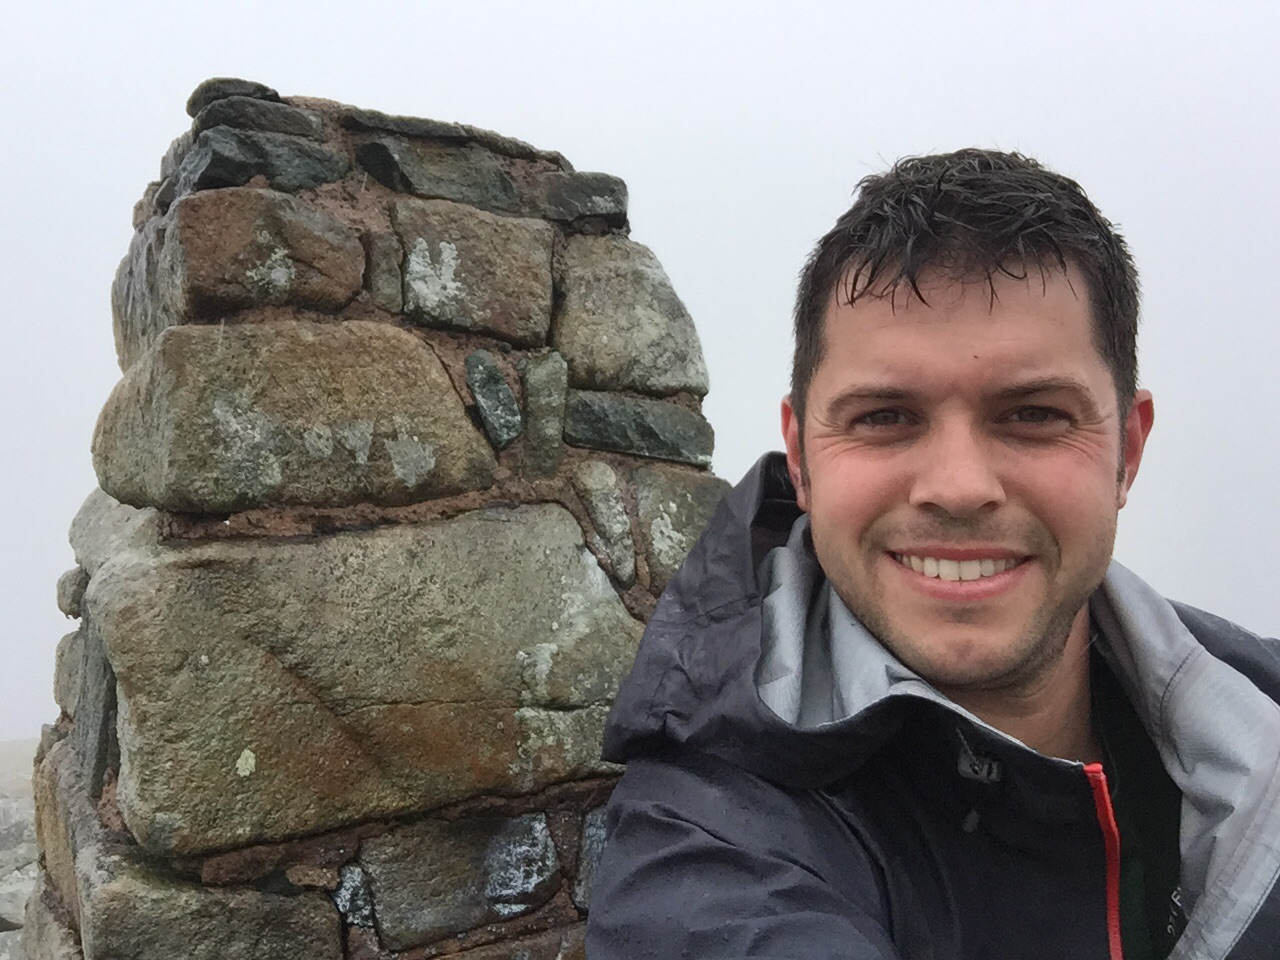 On the summit of Foel-fras.